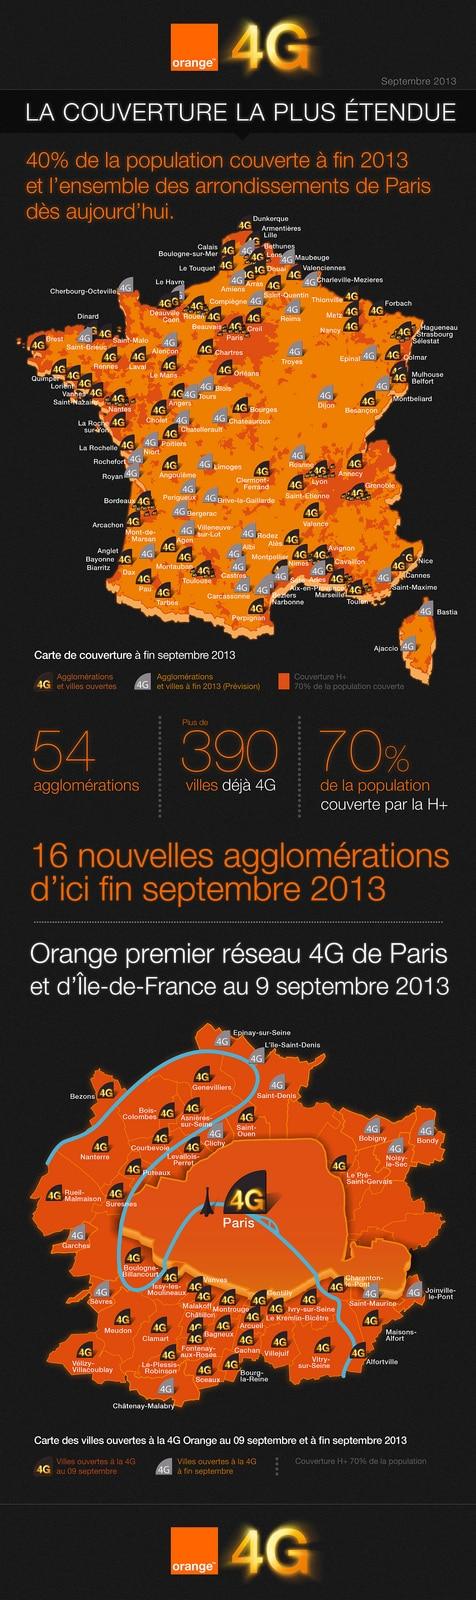 Infographie Orange 4G